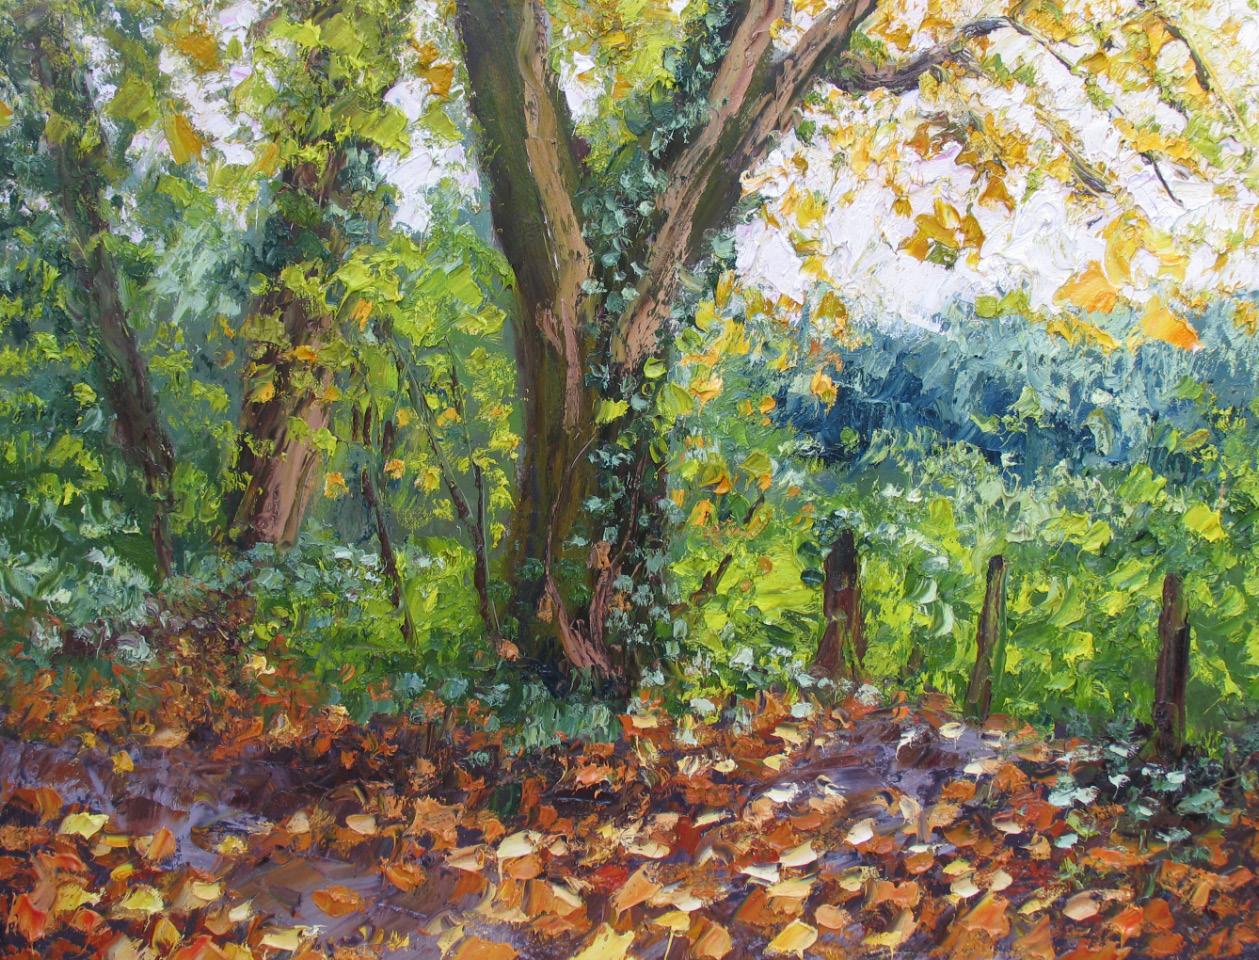 Colin Halliday, Autumn Woods